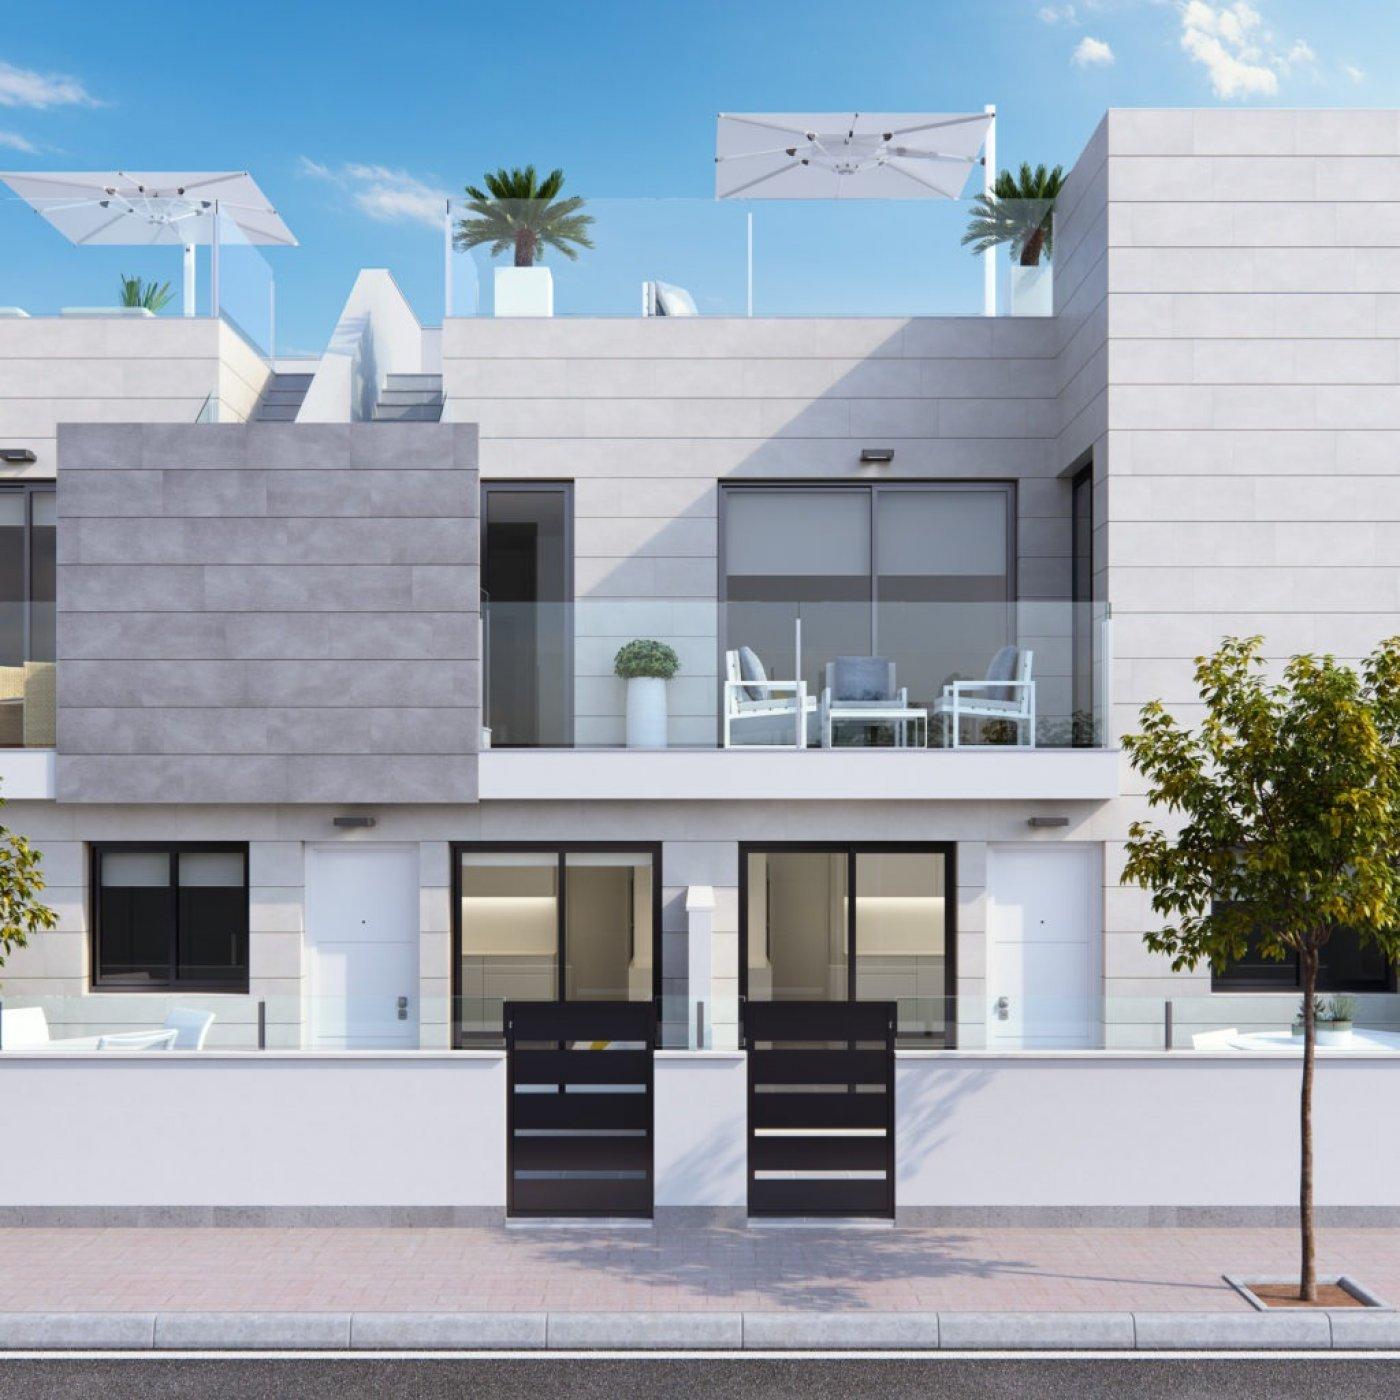 Galerijafbeelding 2 of Laatste begane grond appartement in El Mojón 70 meter van het strand